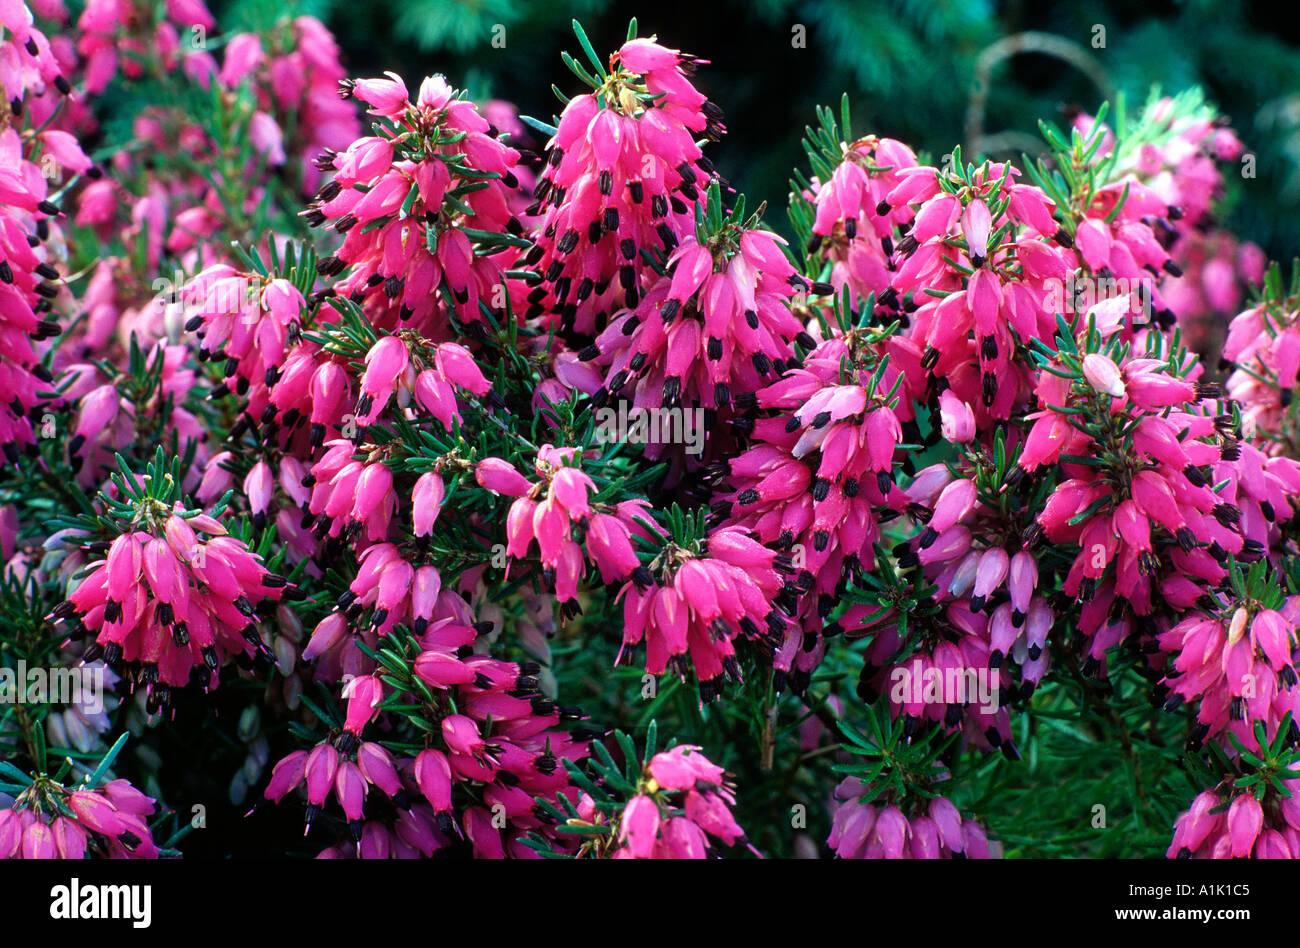 Erica Carnea 'Myretoun Ruby', 'Myrtoun Ruby' heather heathers ericas - Stock Image